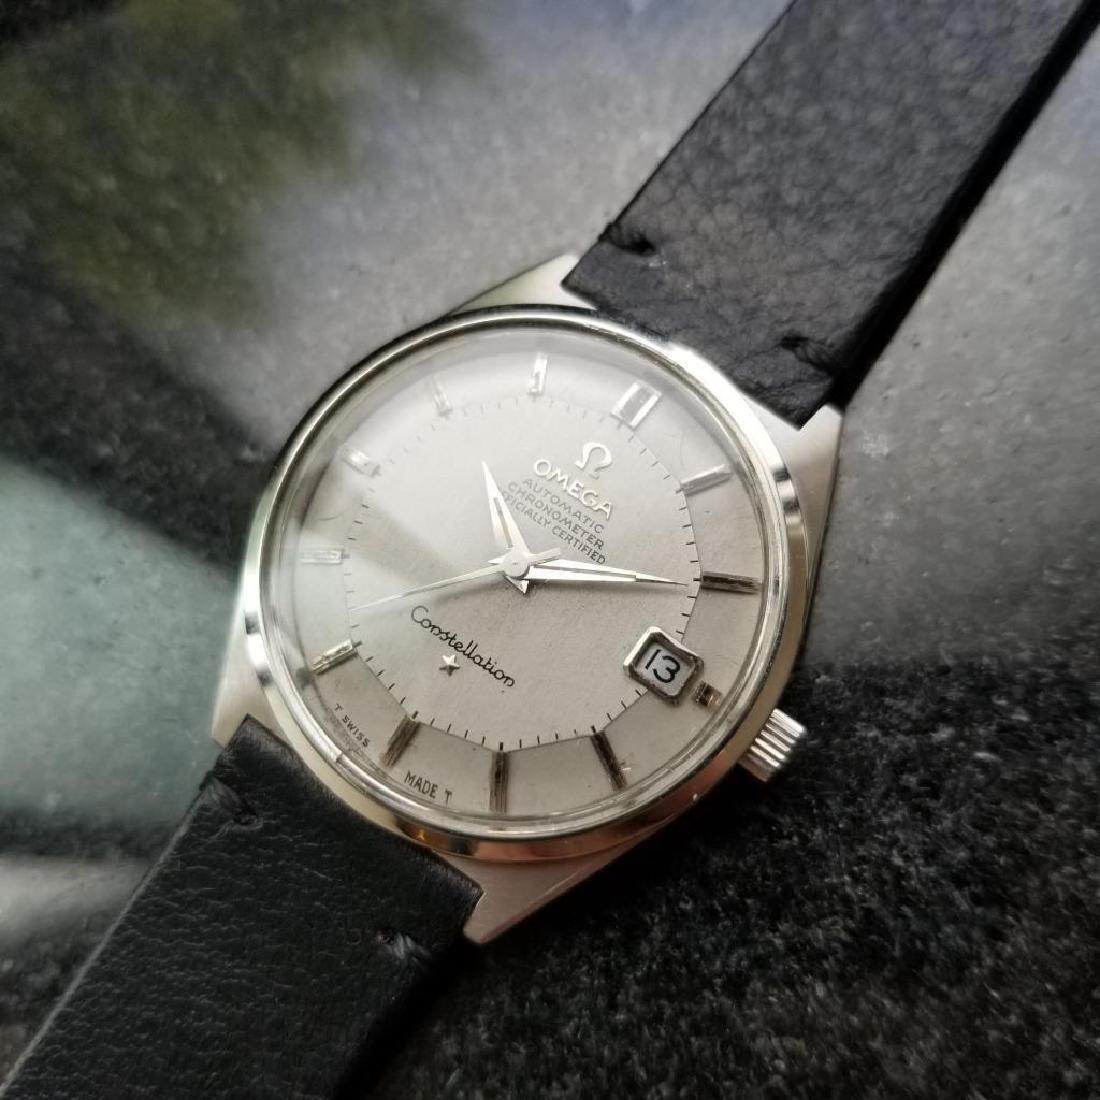 Omega Vintage 1968 Constellation Piepan Rare Automatic - 3